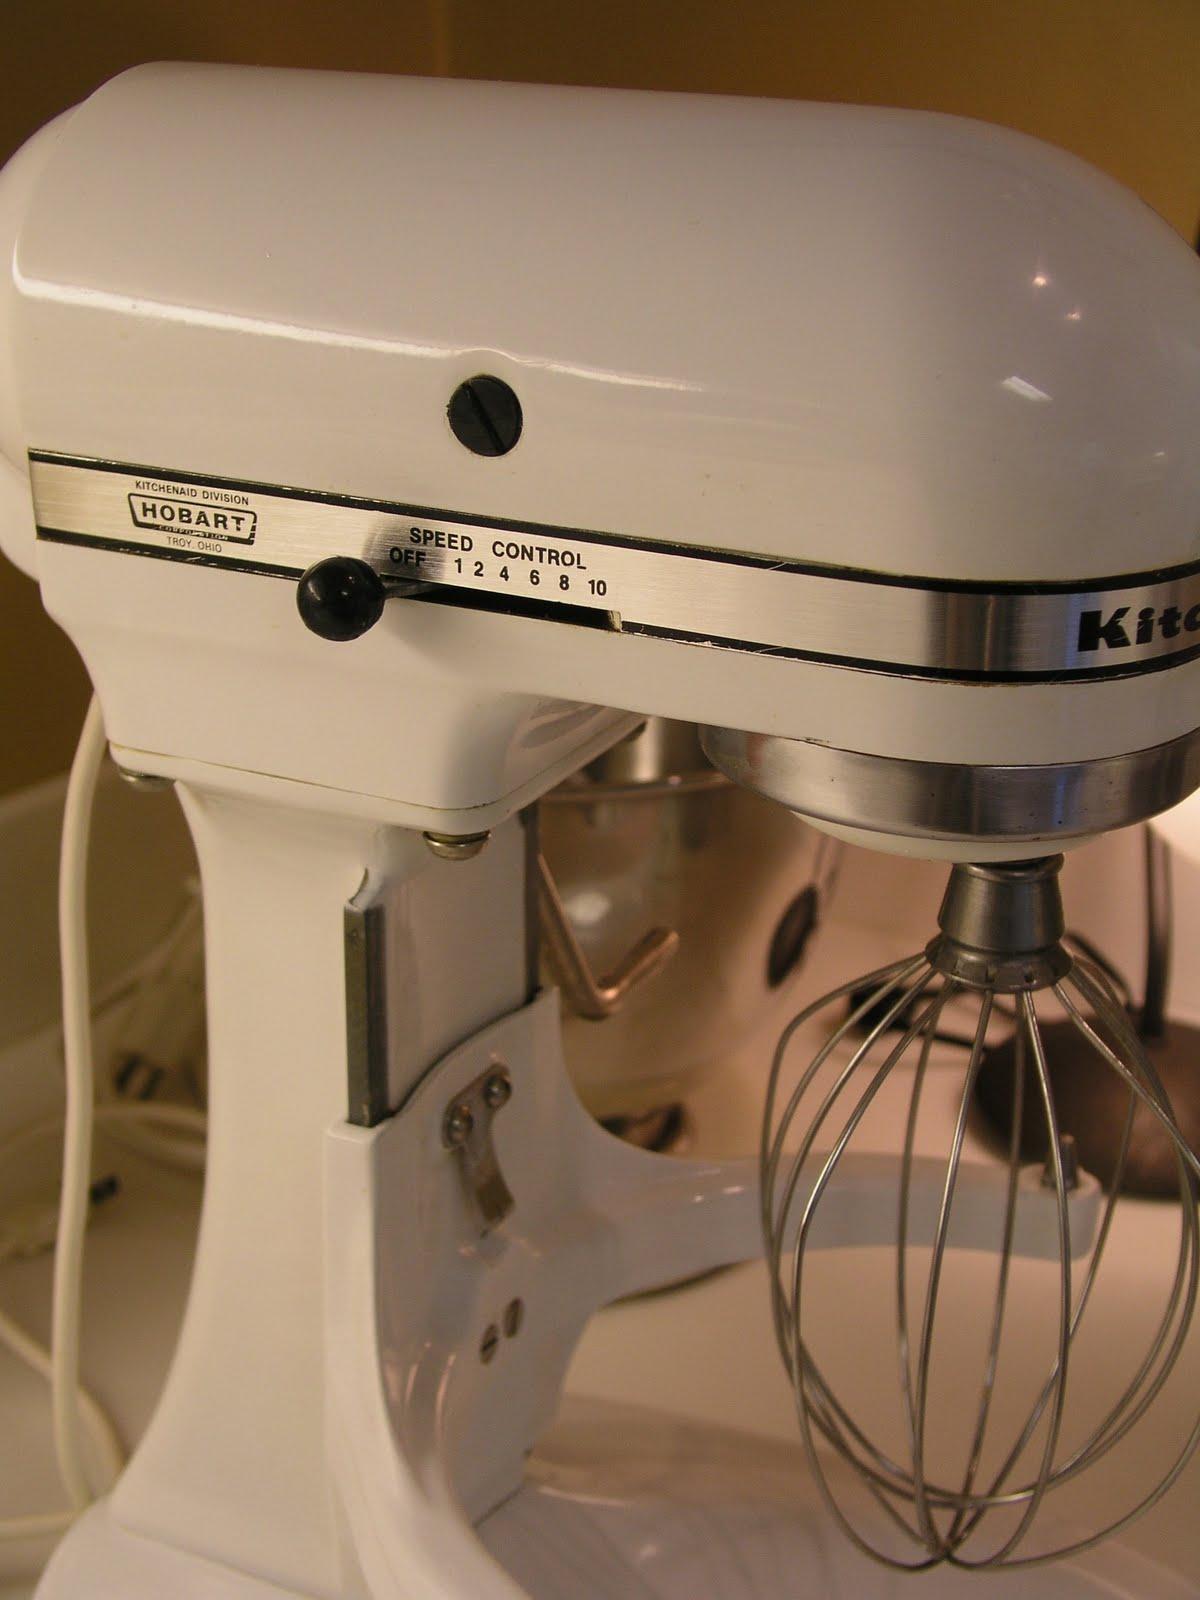 Uncategorized. Kitchen Appliances Hobart. wingsioskins Home Design